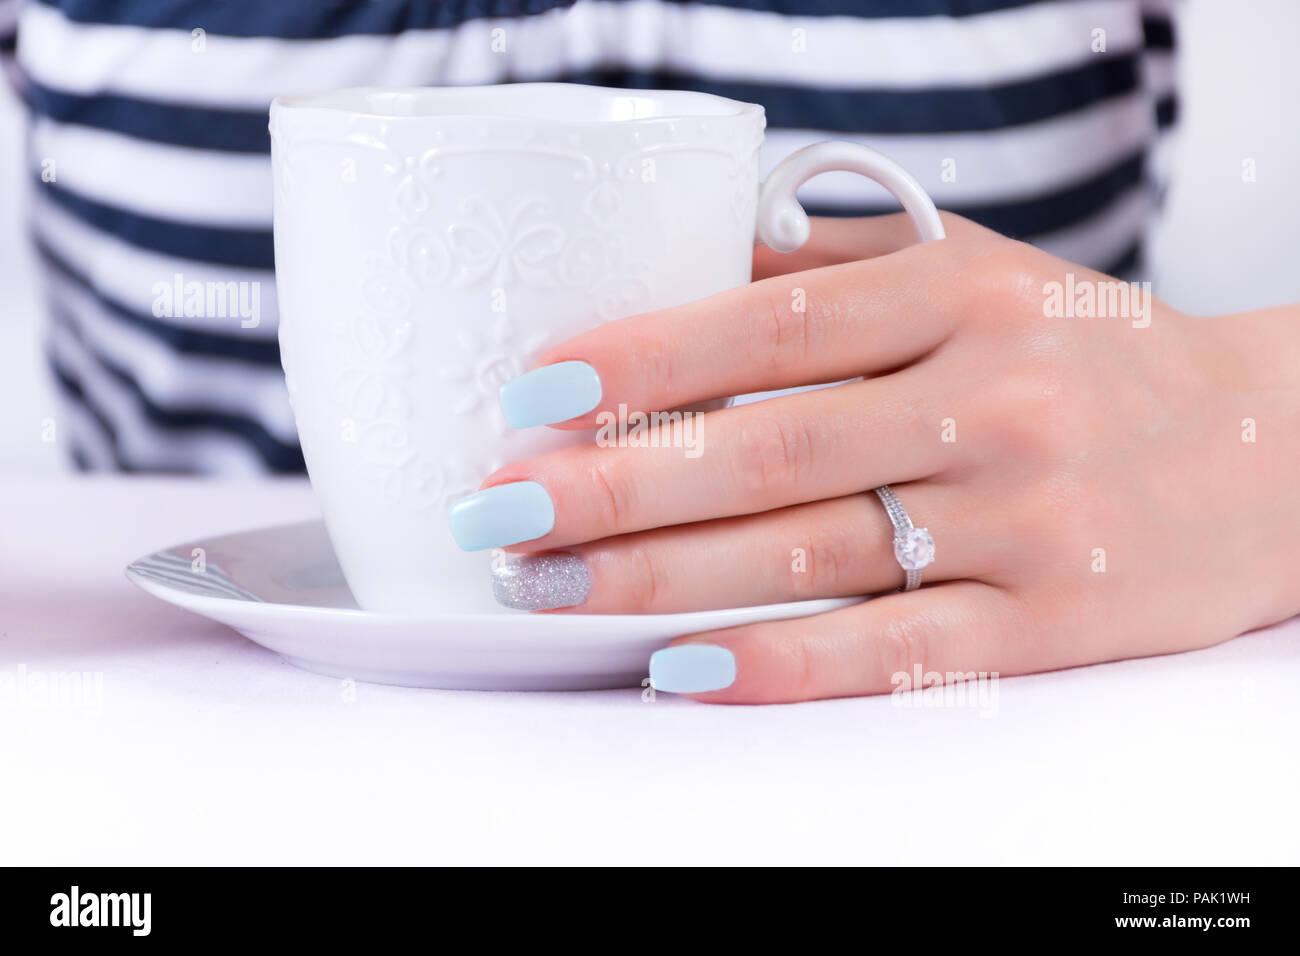 Diamond Wedding Ring Stock Photos & Diamond Wedding Ring Stock ...